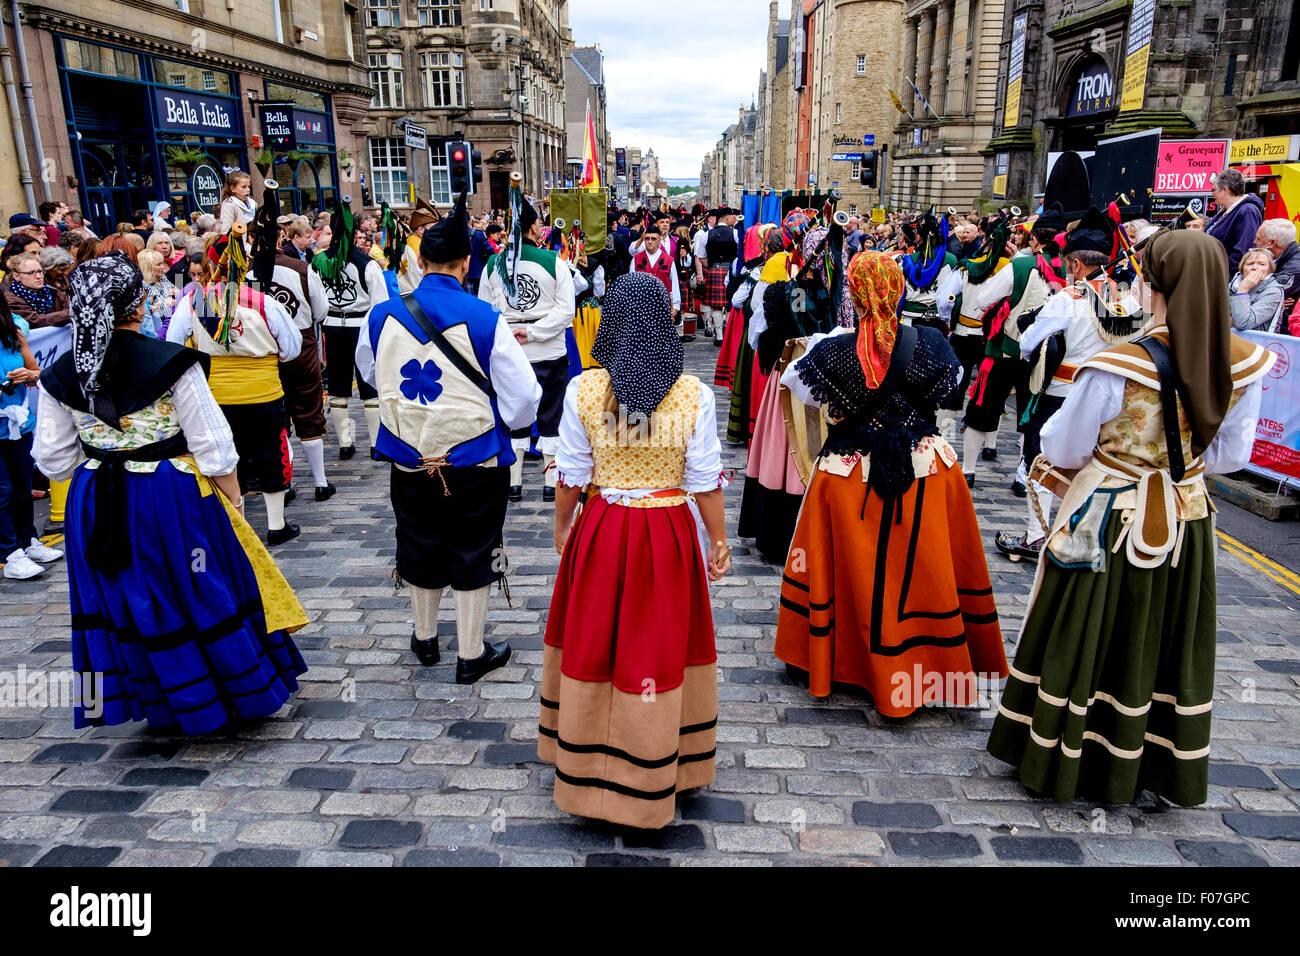 Banda De Gaitas Resping from Madrid, Spain at Pipefest 2015 Edinburgh - Stock Image